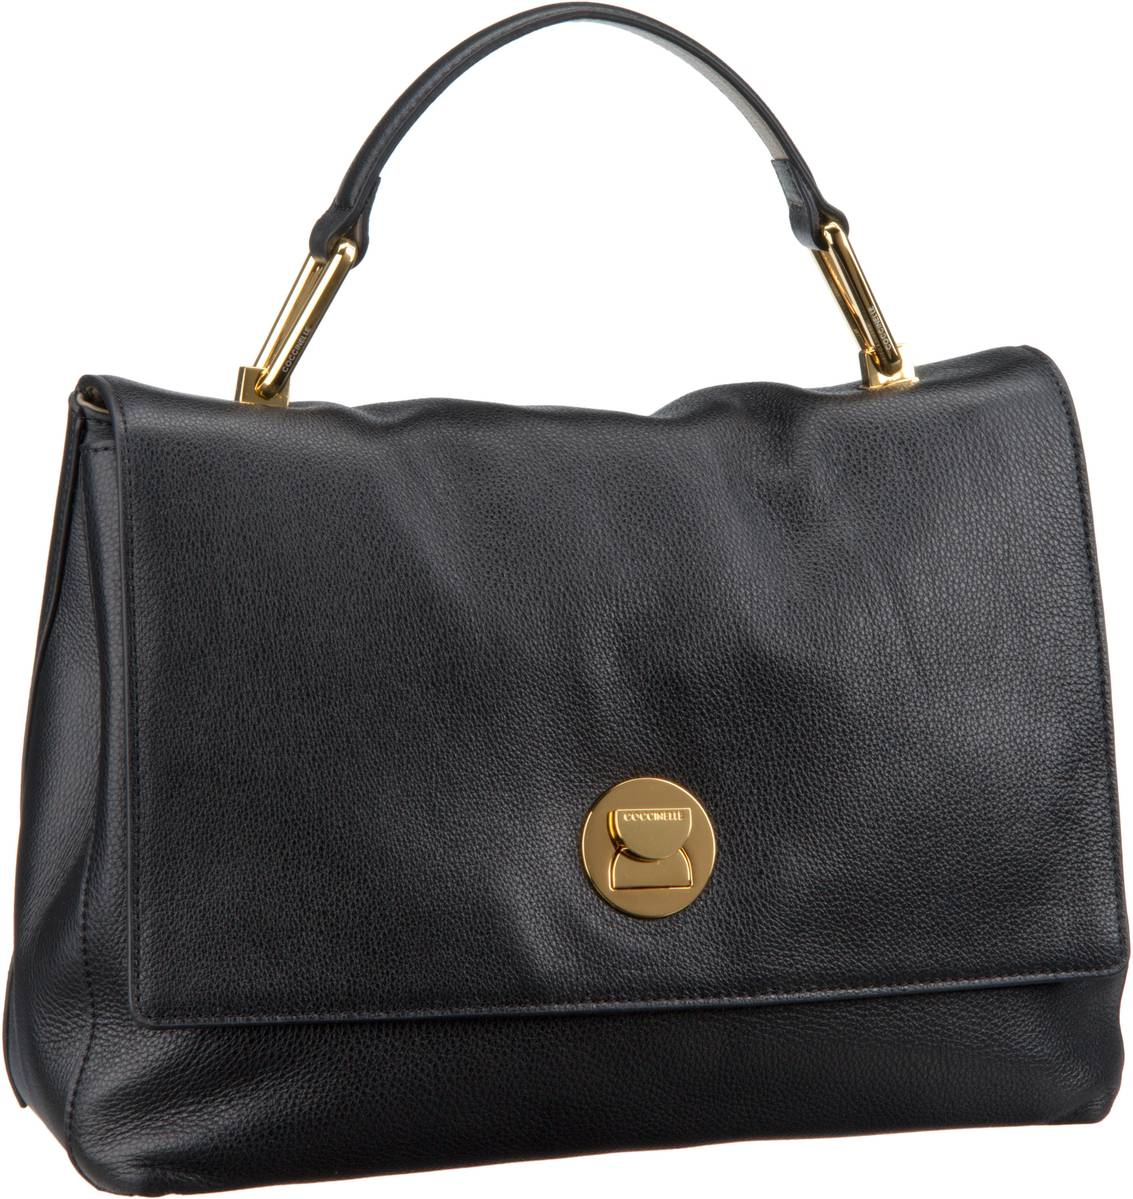 Handtasche Liya 1801 Noir (innen: Lachsfarben)